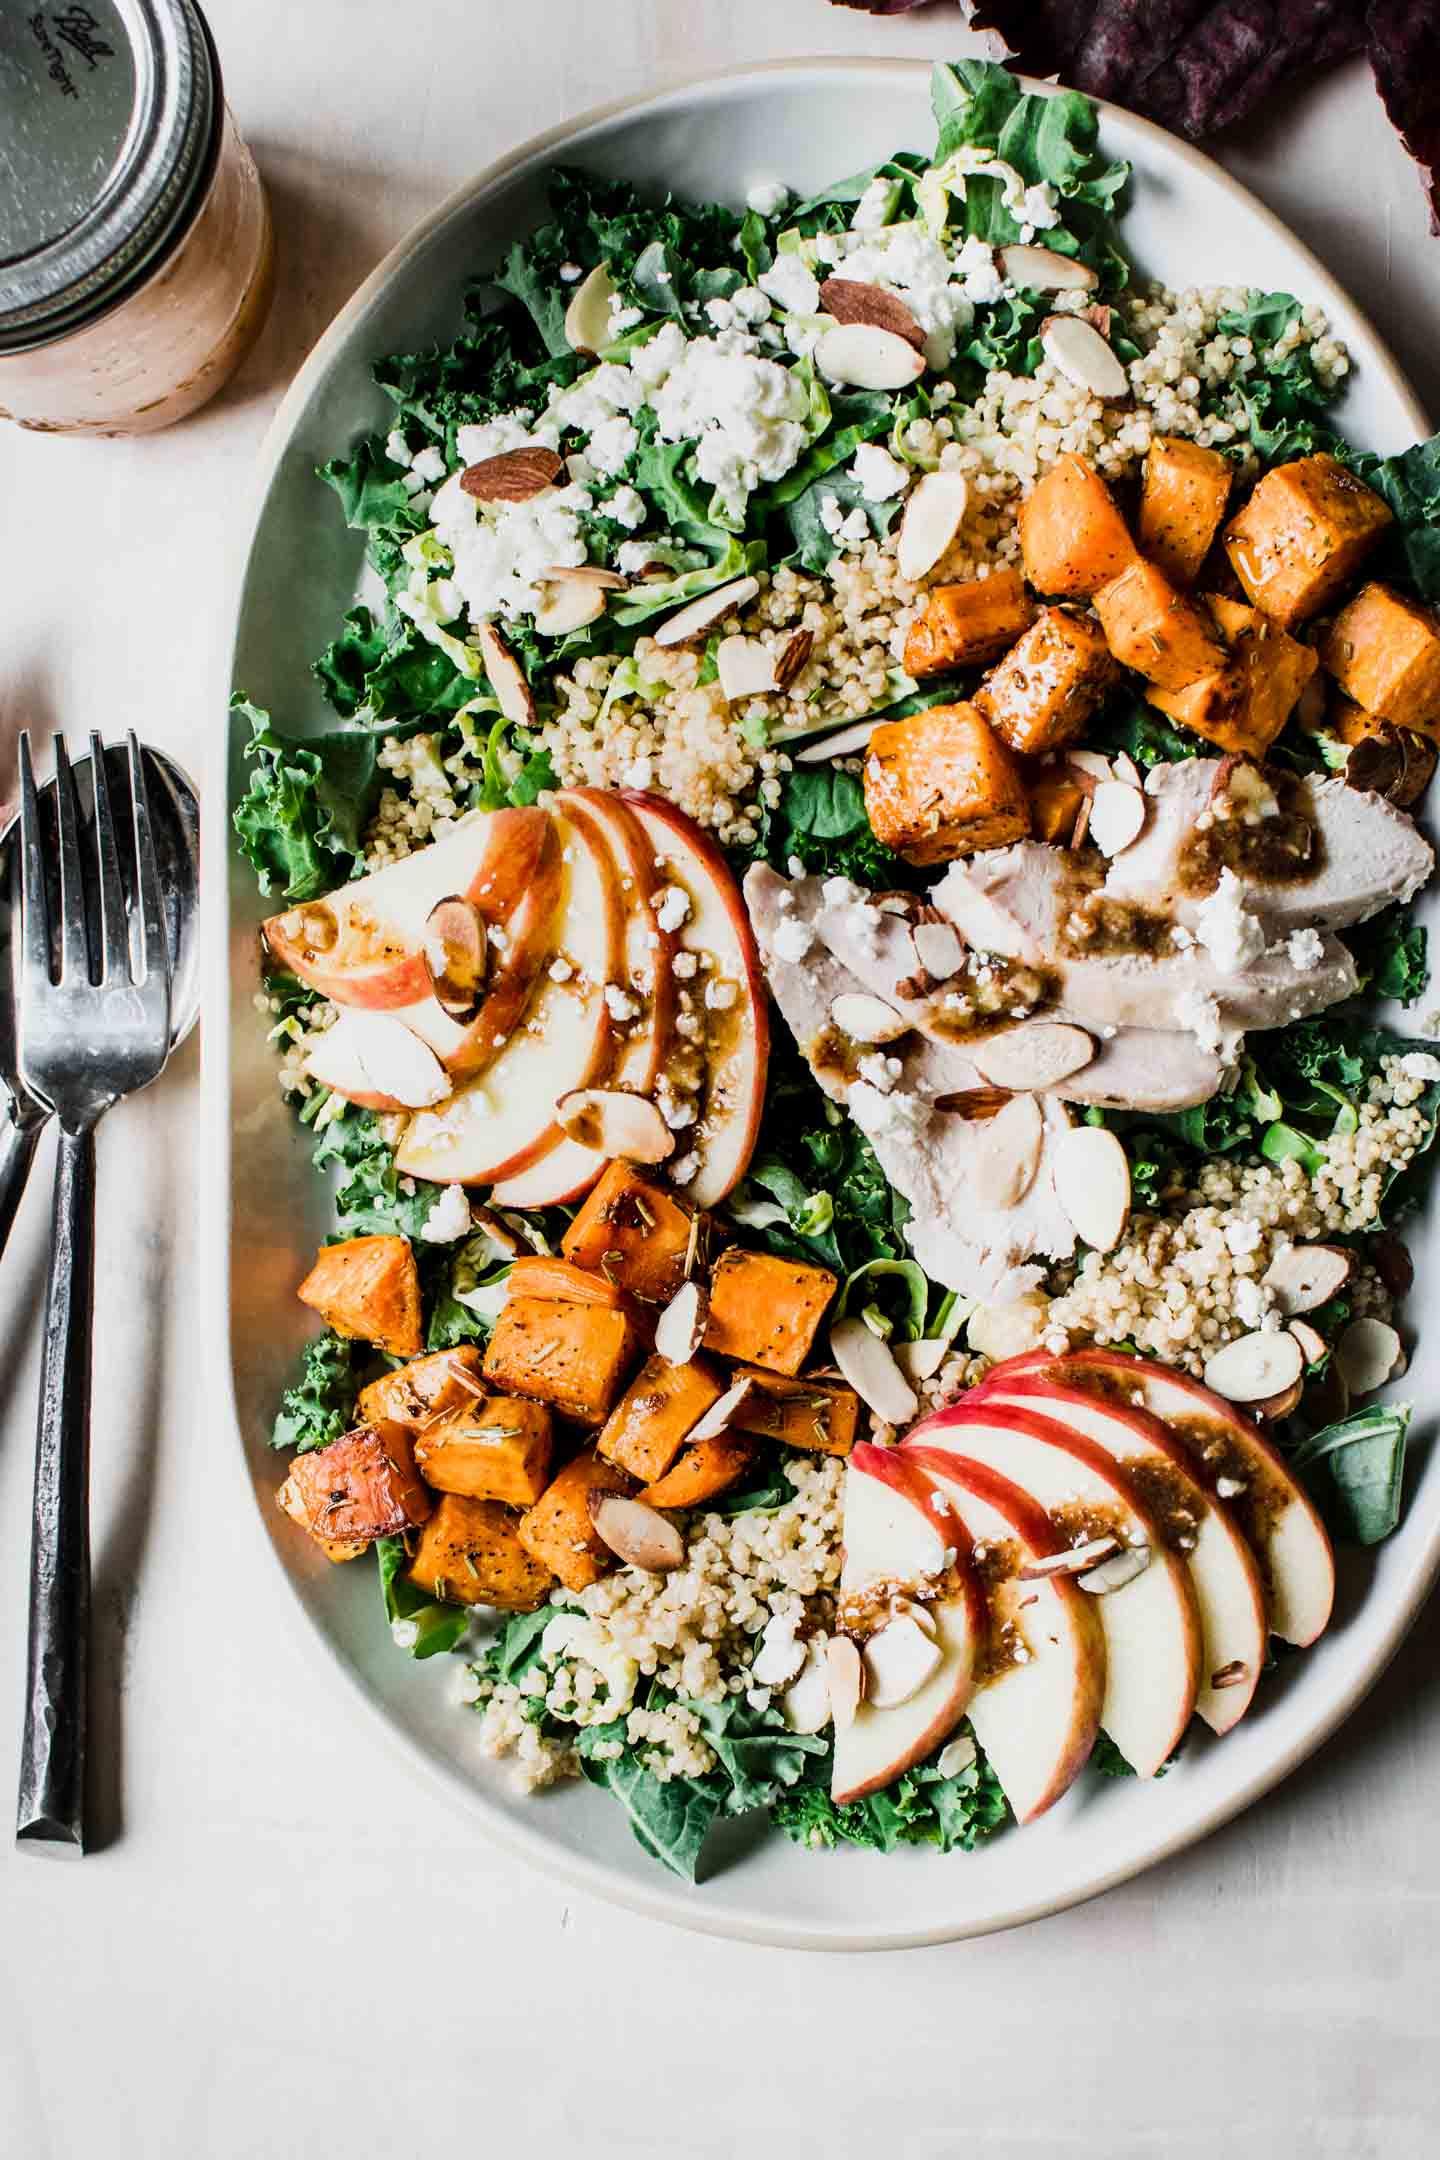 Autumn Kale Salad Urban Foodie Kitchen